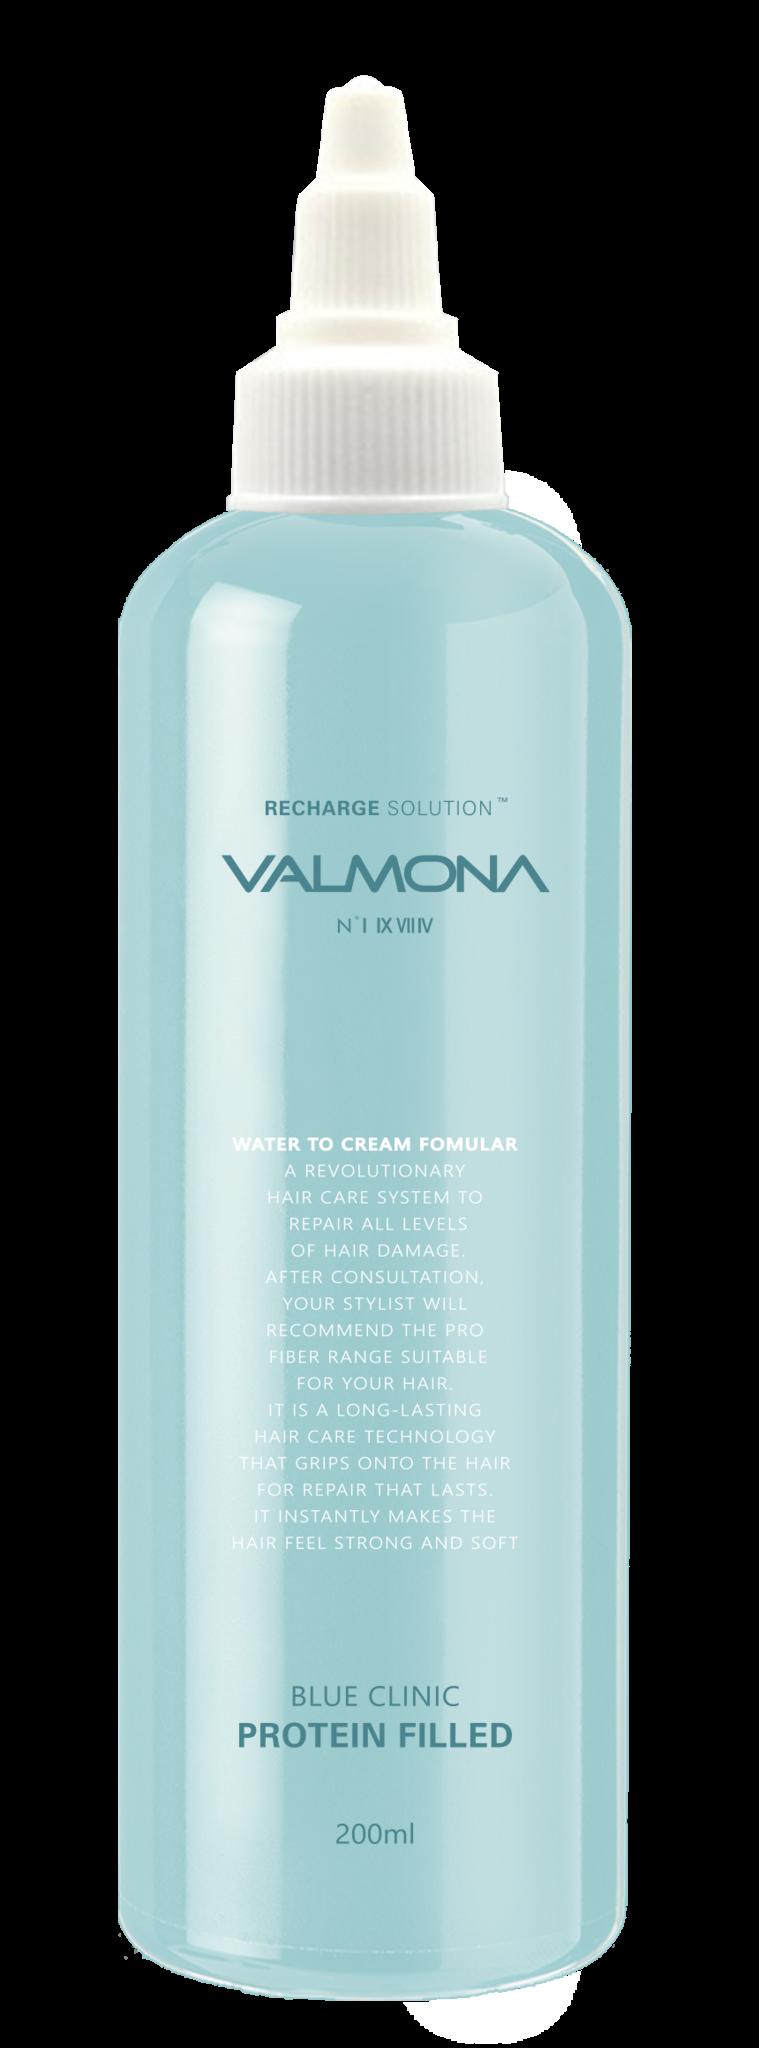 Маска для волос увлажняющая Evas Valmona Blue Clinic Protein Filled 200ml 2 - Фото 2